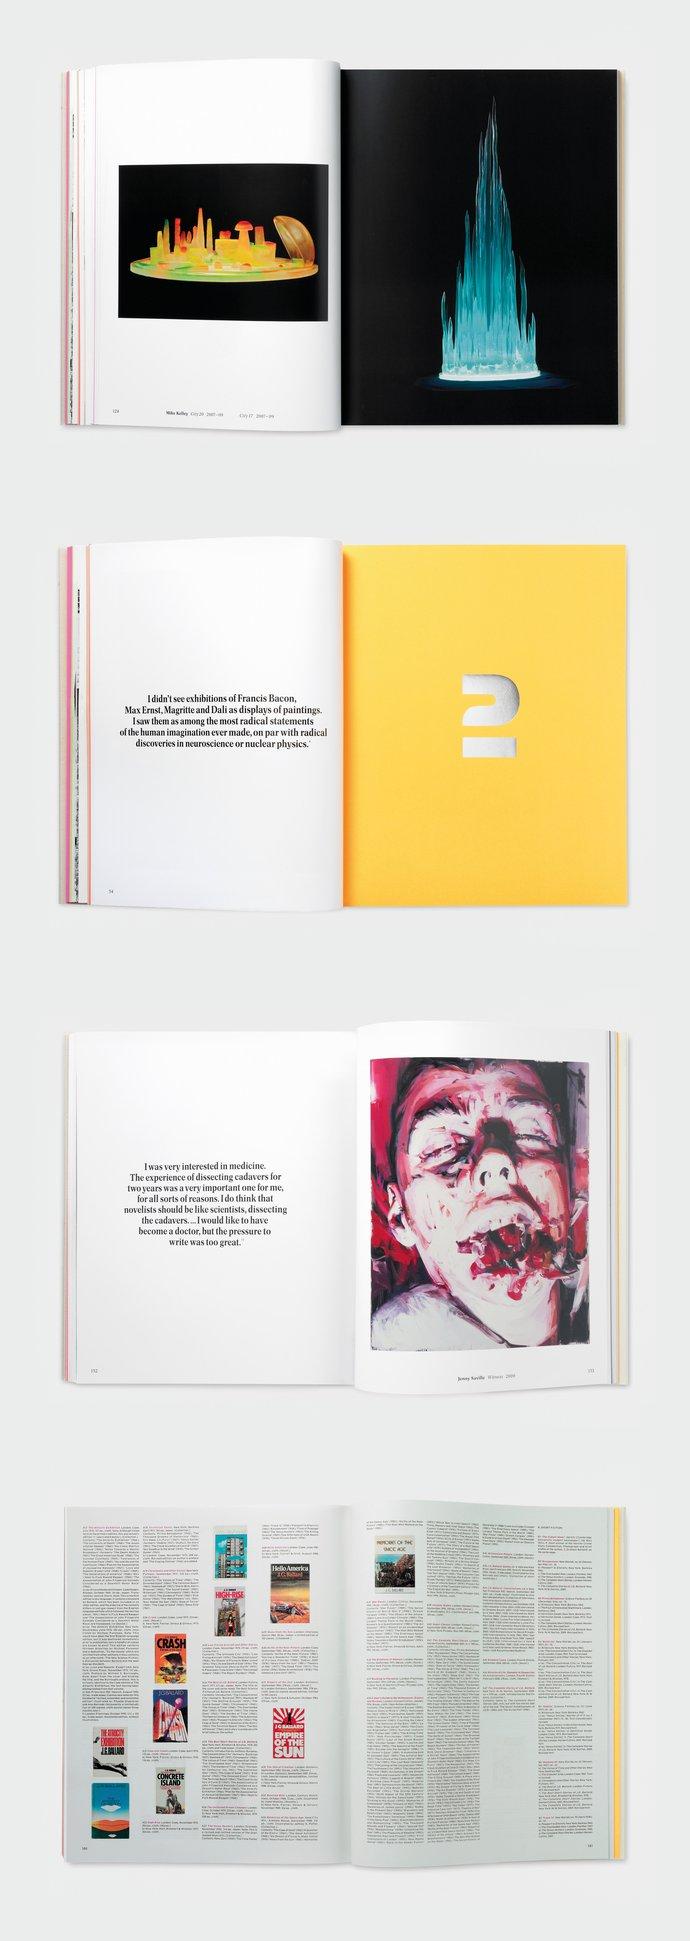 Gagosian – Crash: Homage to JG Ballard, 2010 (Publication), image 7